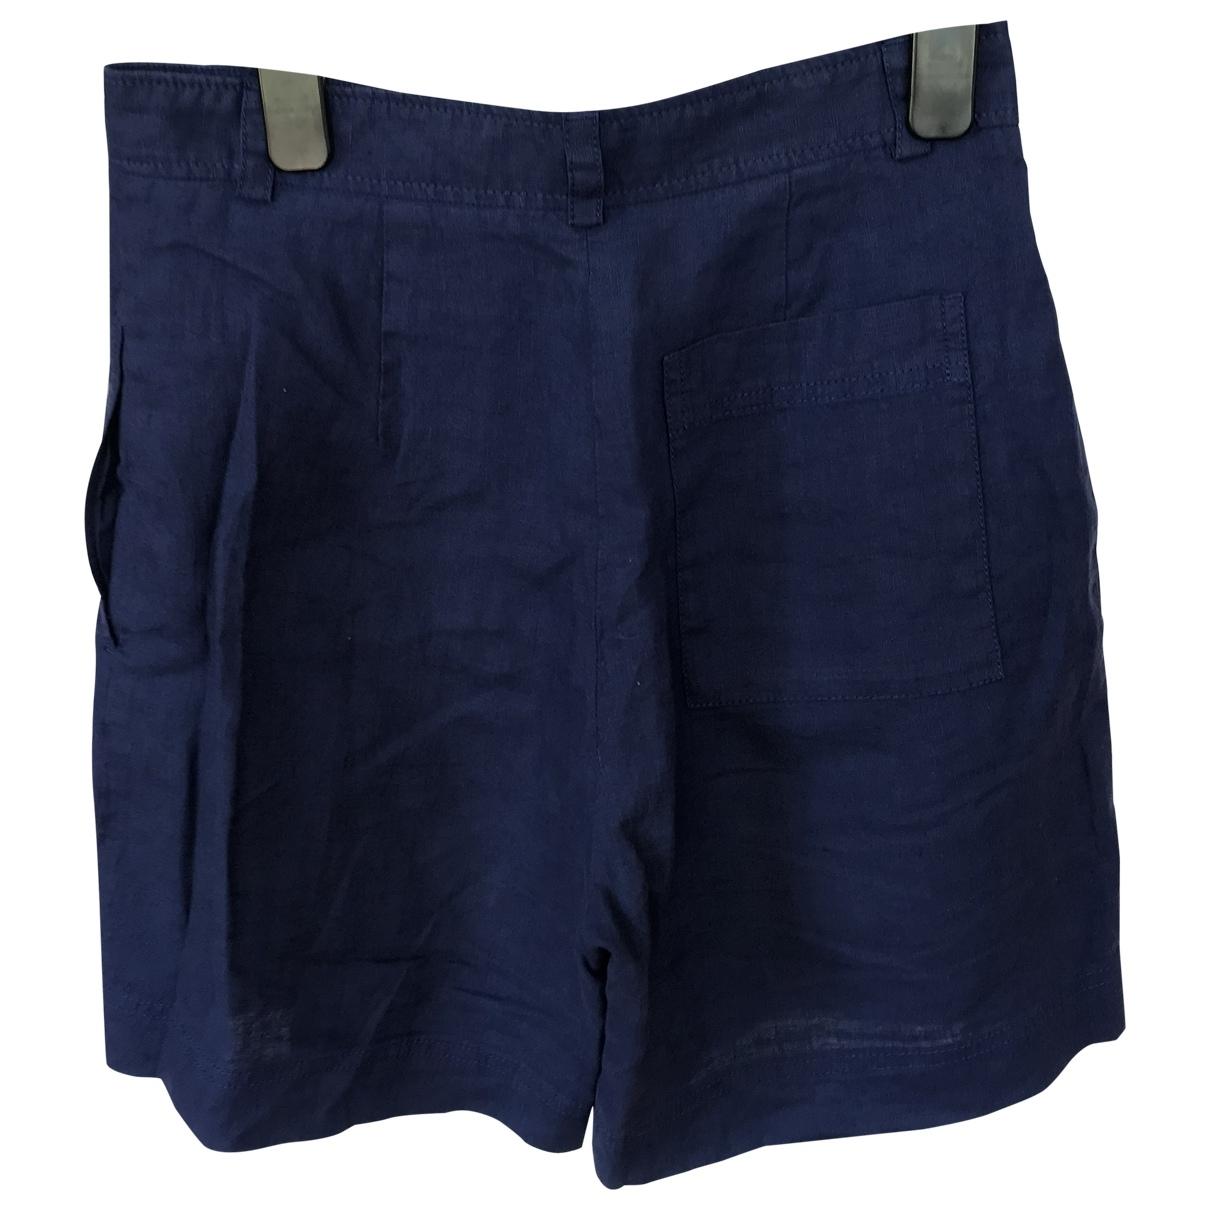 Lk Bennett - Short   pour femme en toile - bleu